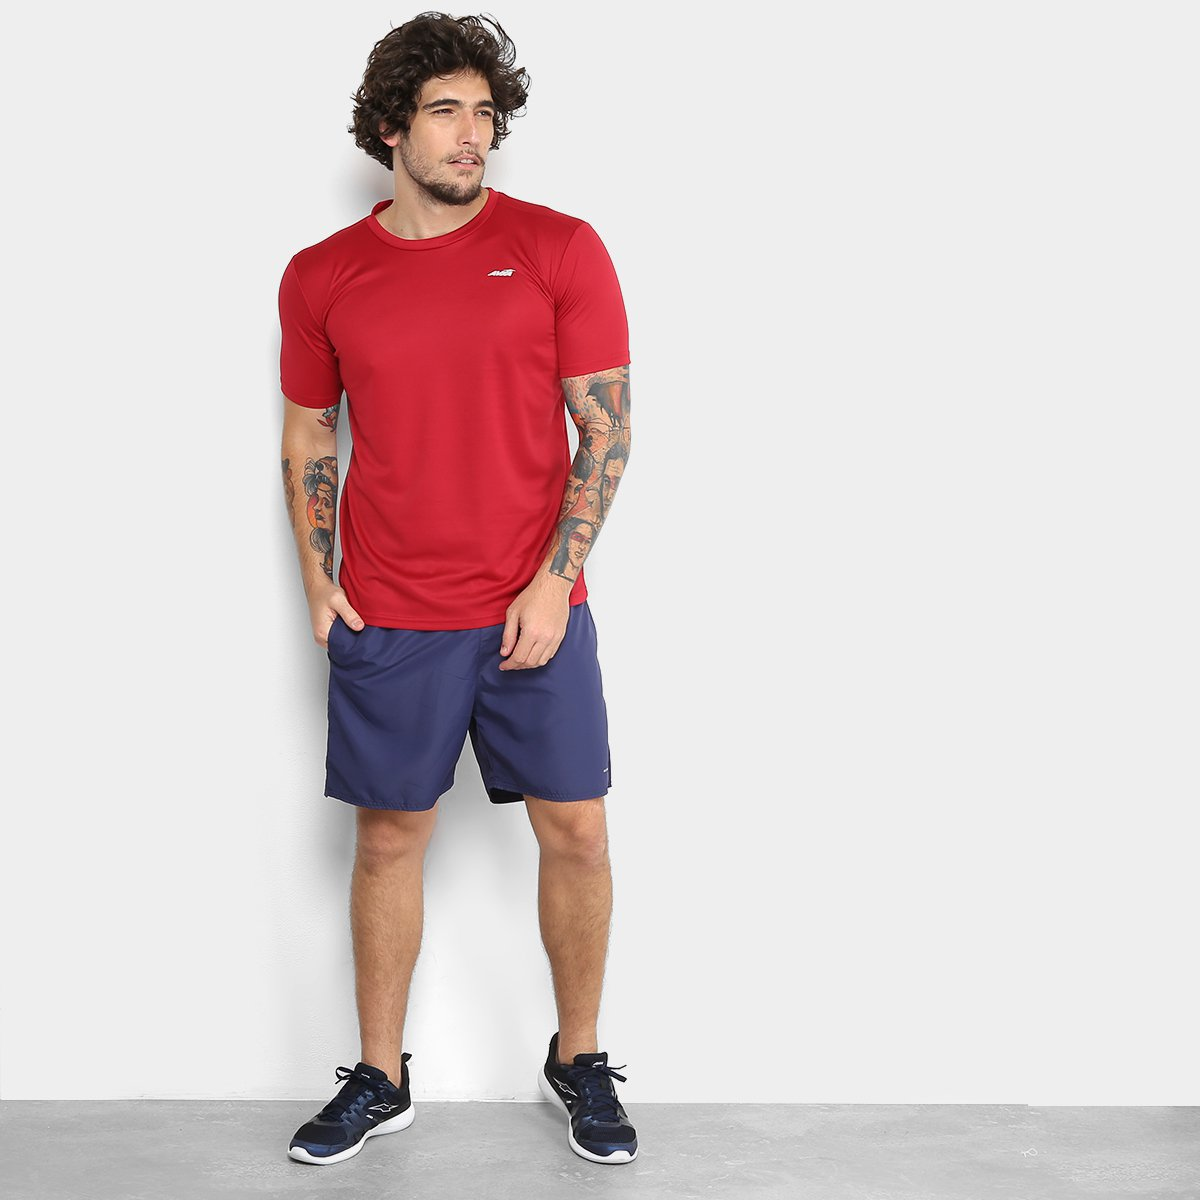 ... Foto 3 - Camiseta Avia Bummer Masculina ... 0dbfbe52b33c7